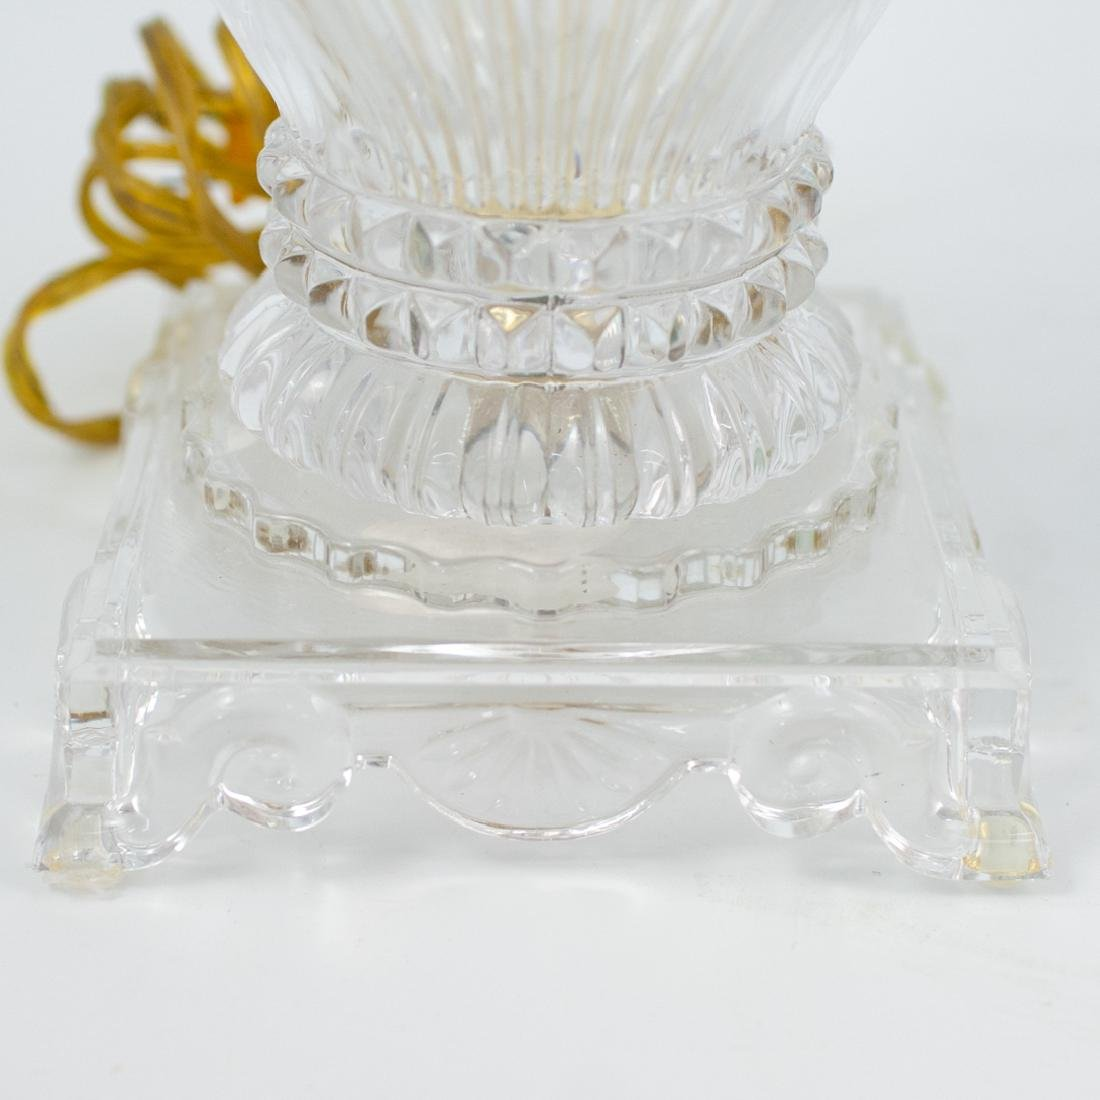 Pair of Cut Crystal Urn Lamps - 4